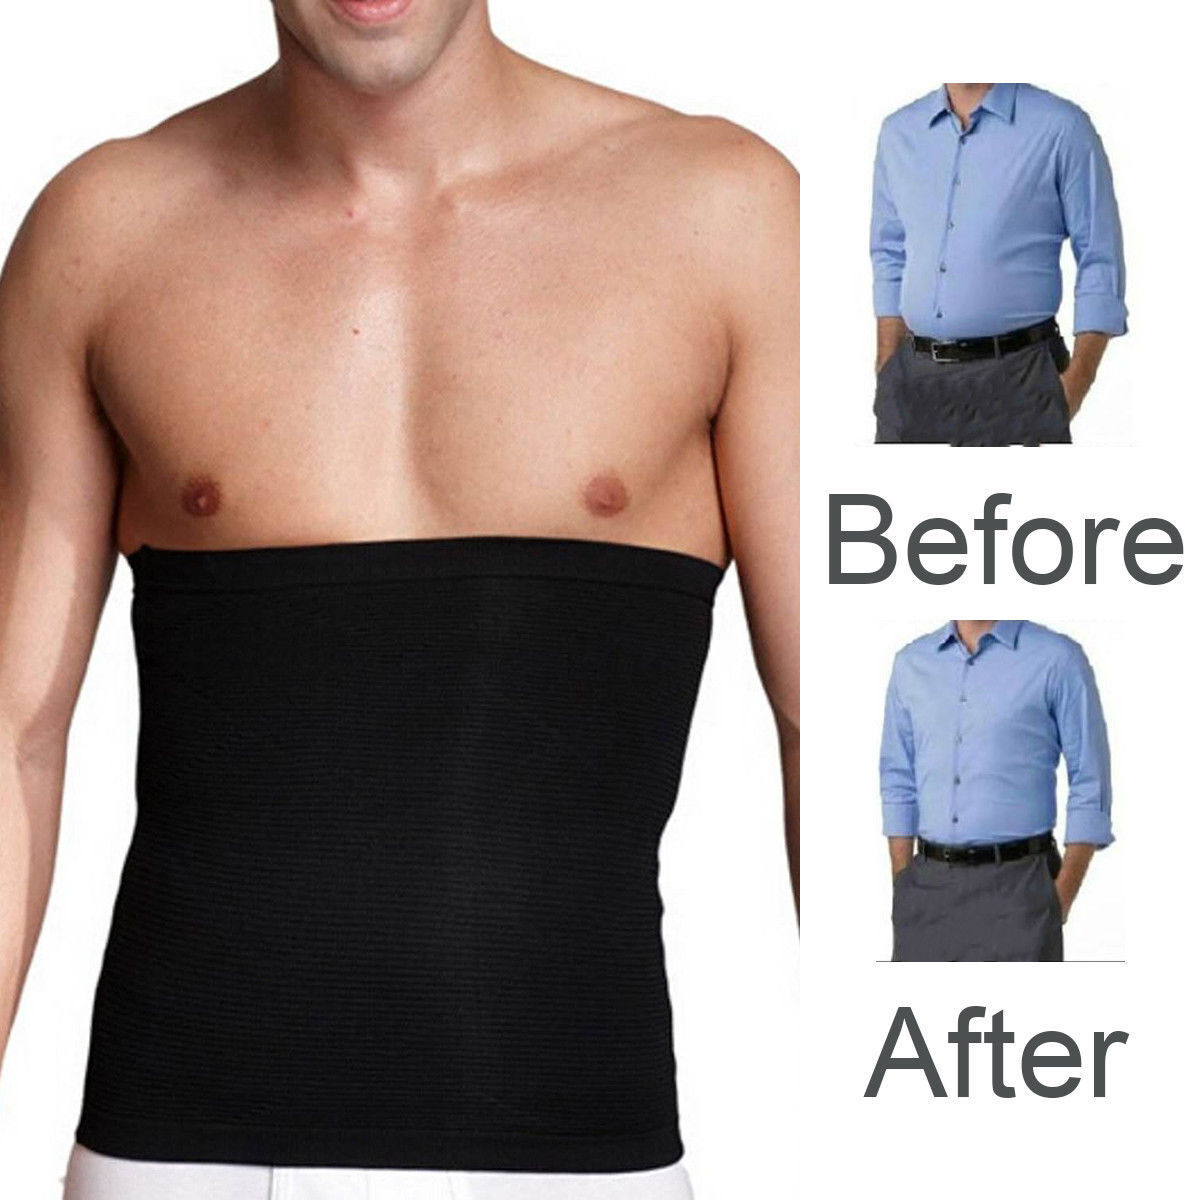 f396f25392 Details about Fat Burner Sauna Tummy Tuck Belt Body Shaper Girdle Belly  Slimmer Waist Trainer